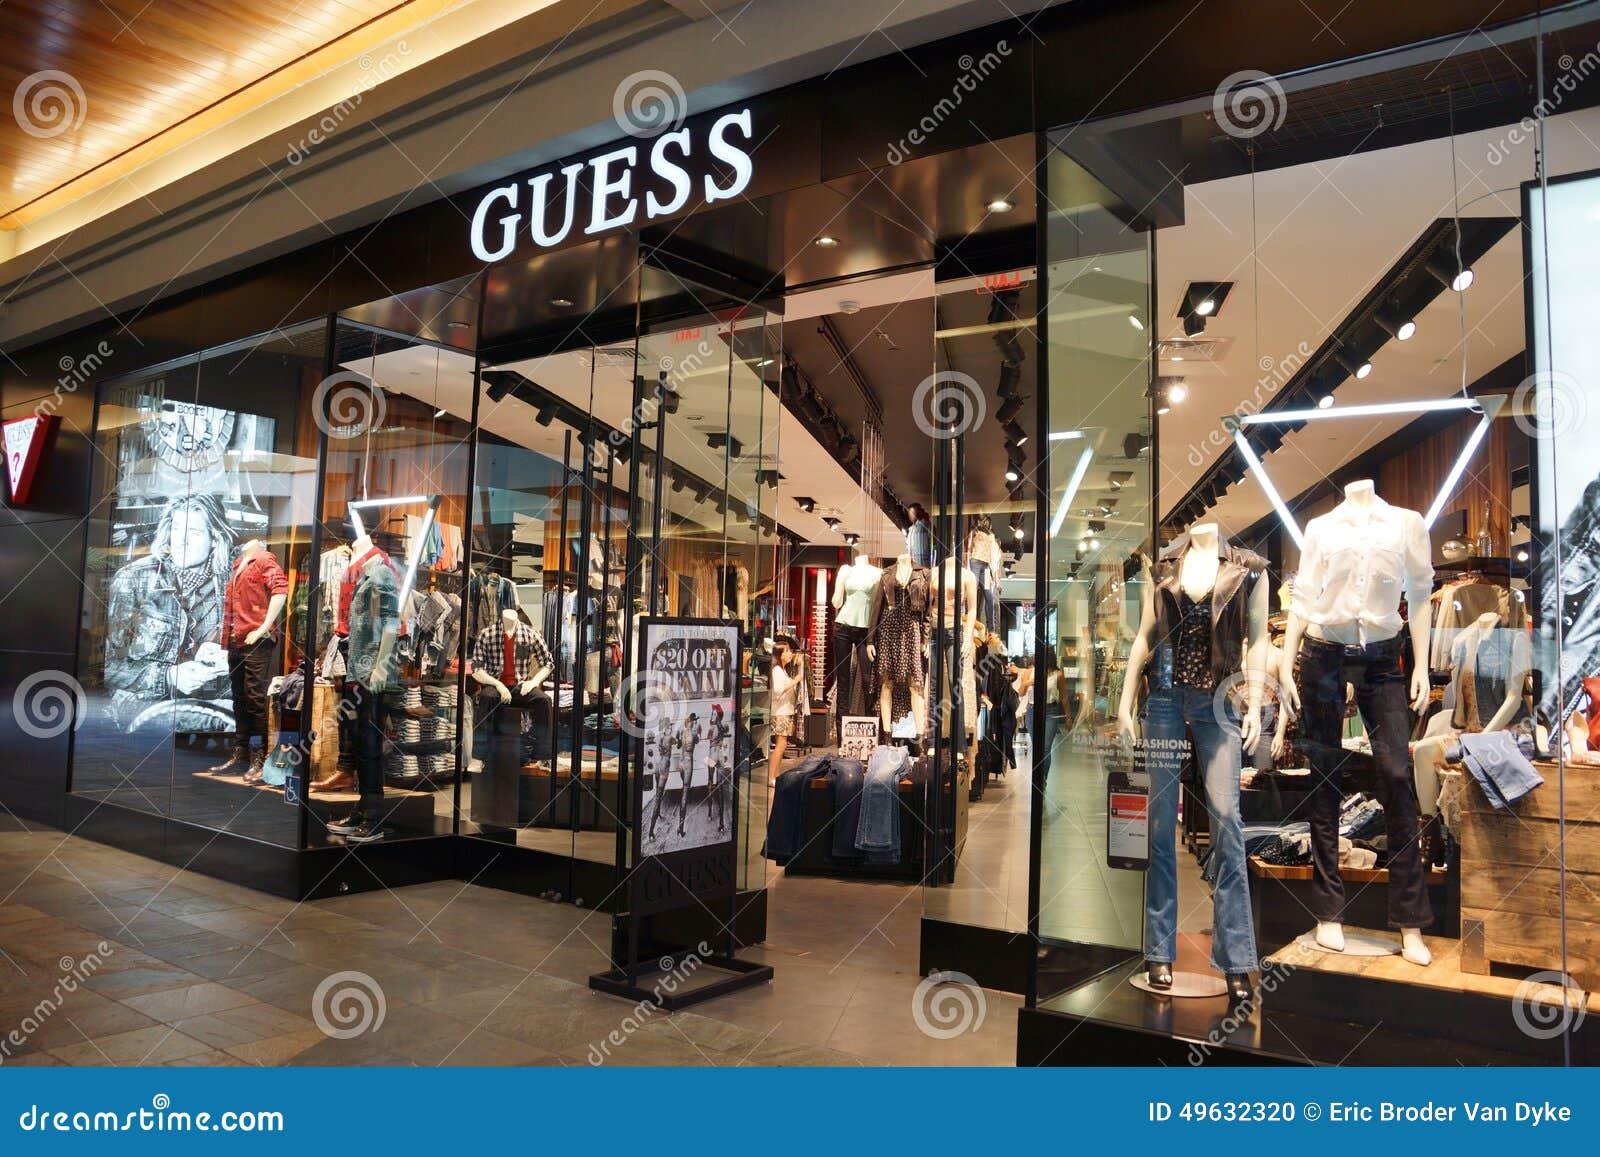 Guess shop online usa store